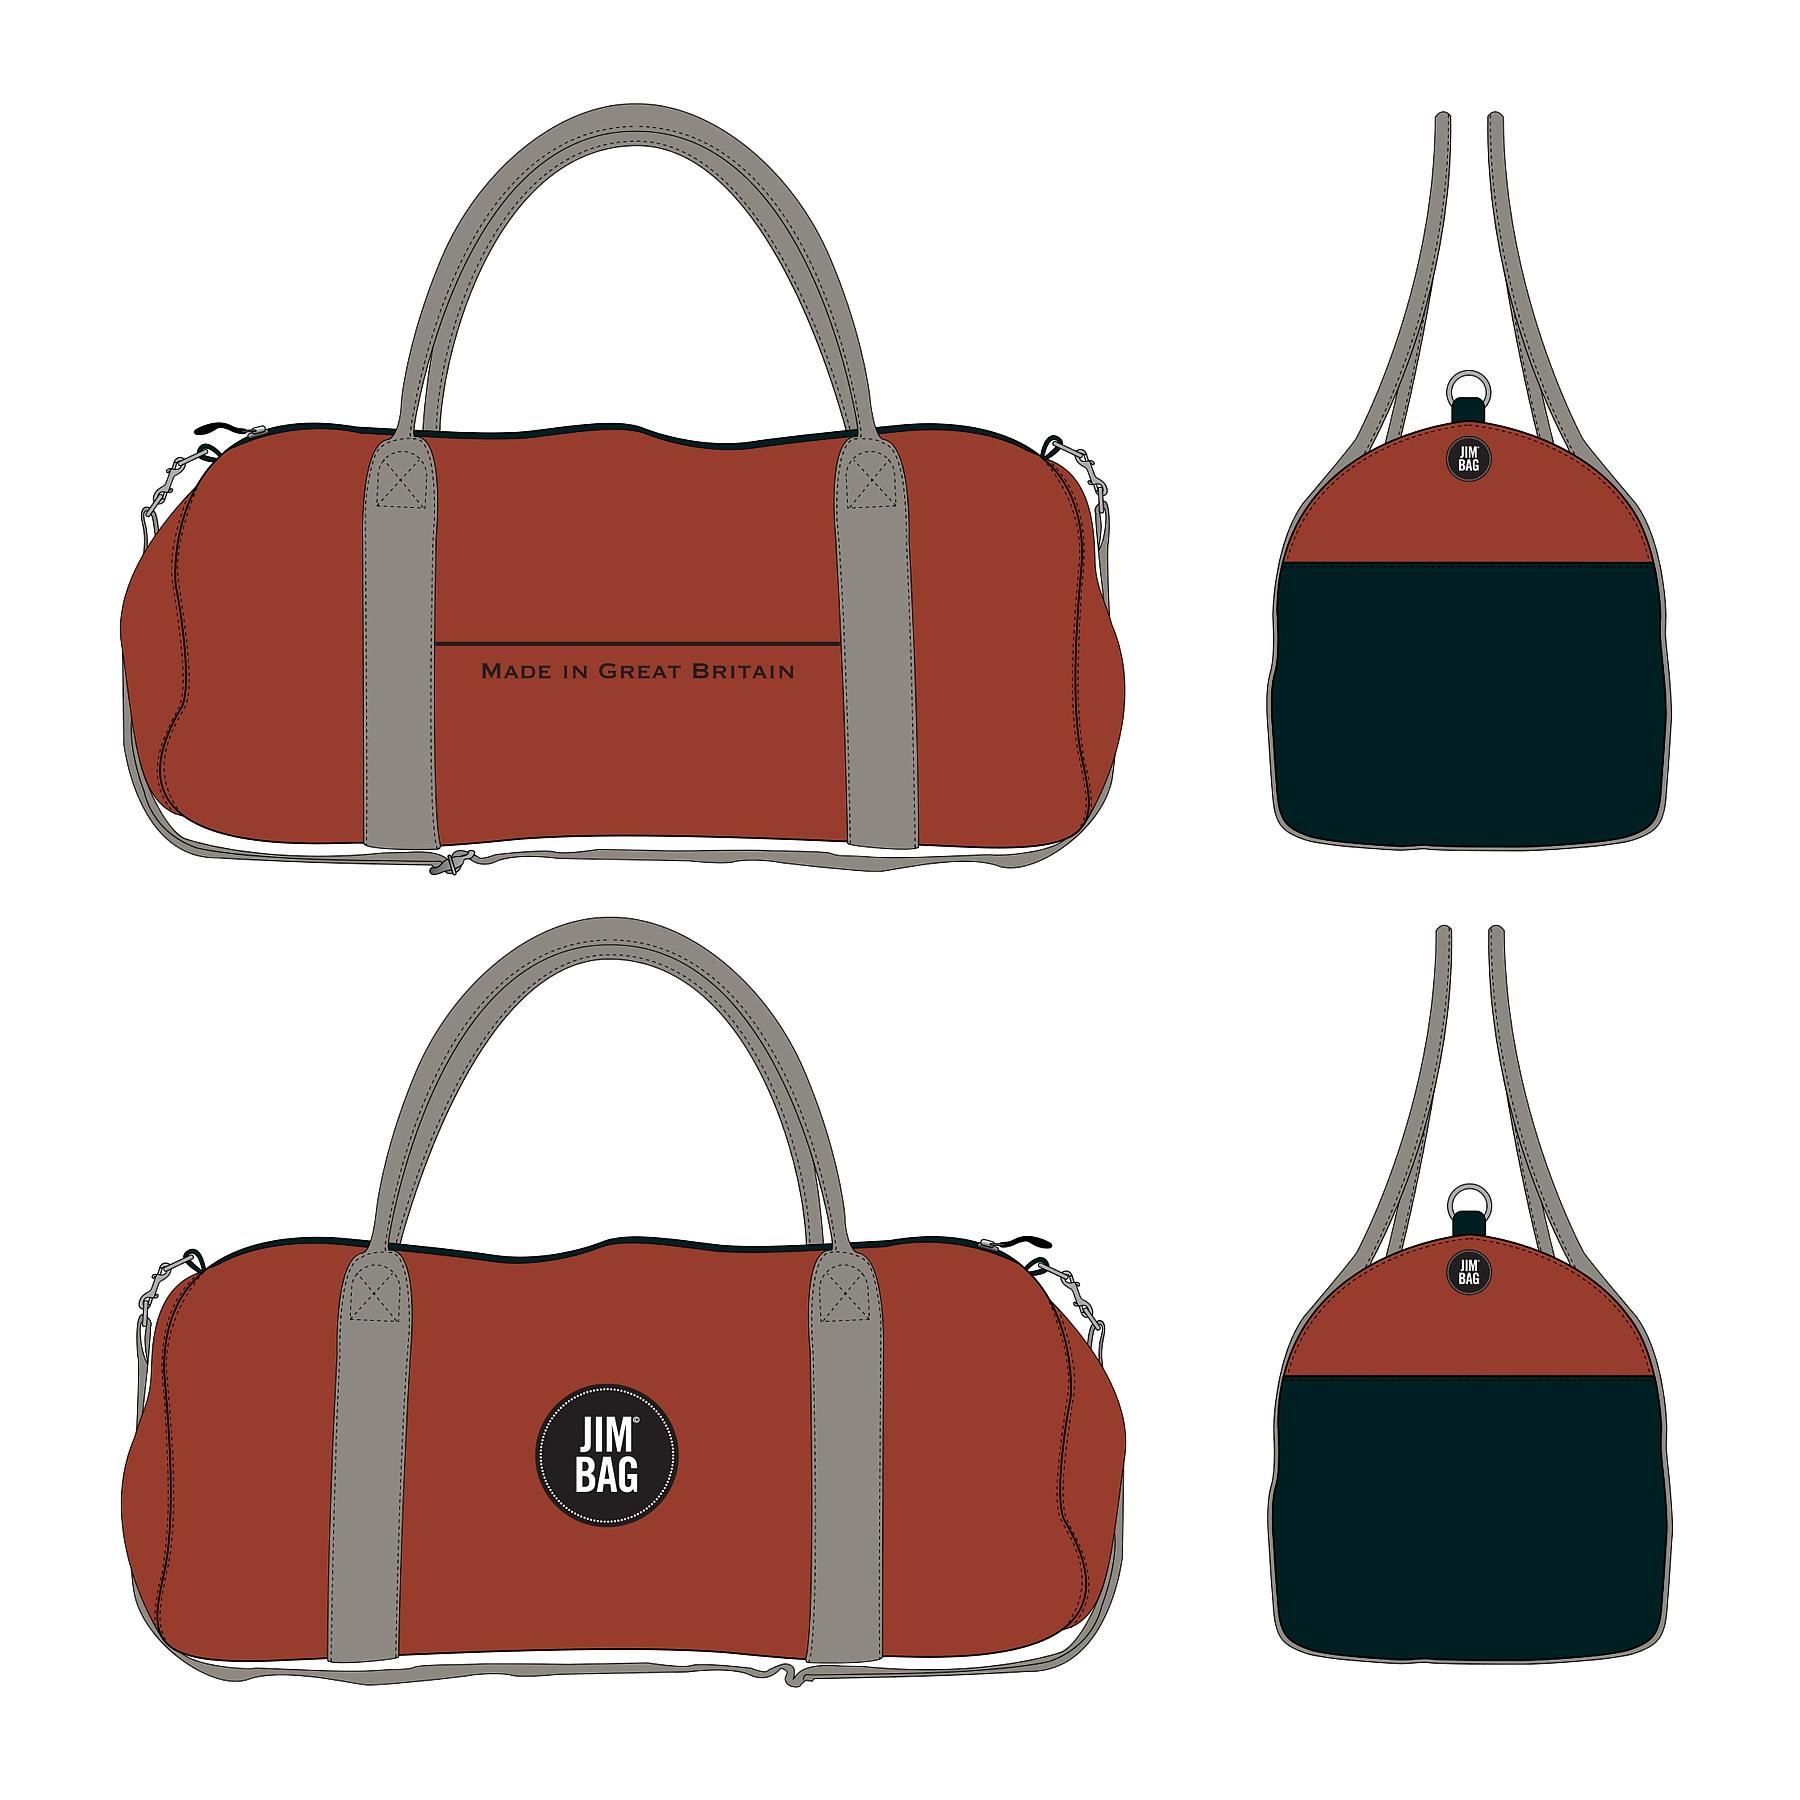 Accessories Design of jim bag